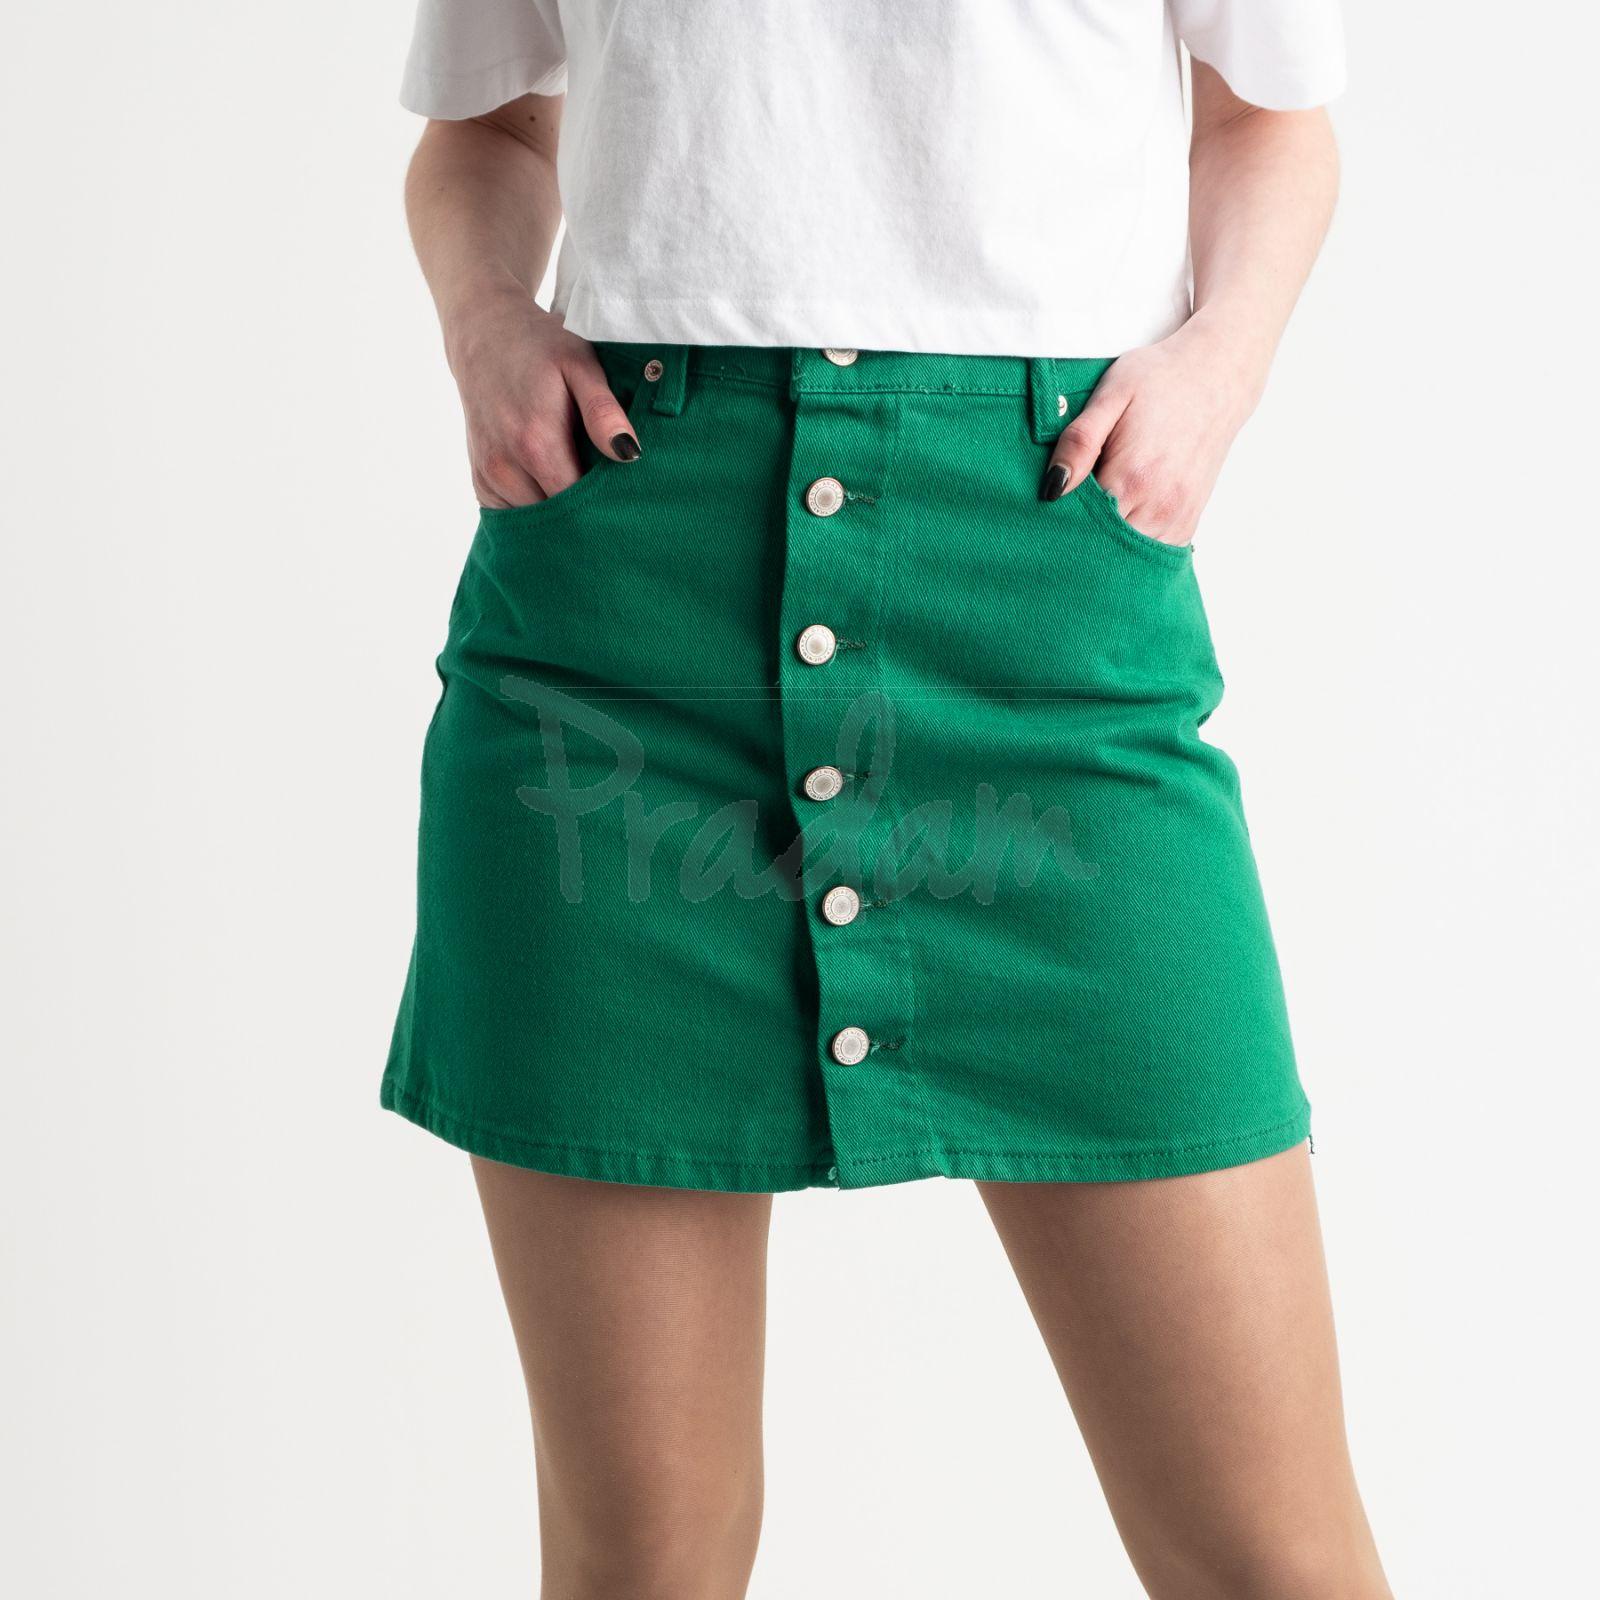 2854-3 XRay юбка на пуговицах зеленая котоновая (6 ед. размеры: 34.34.36.36.38.40)